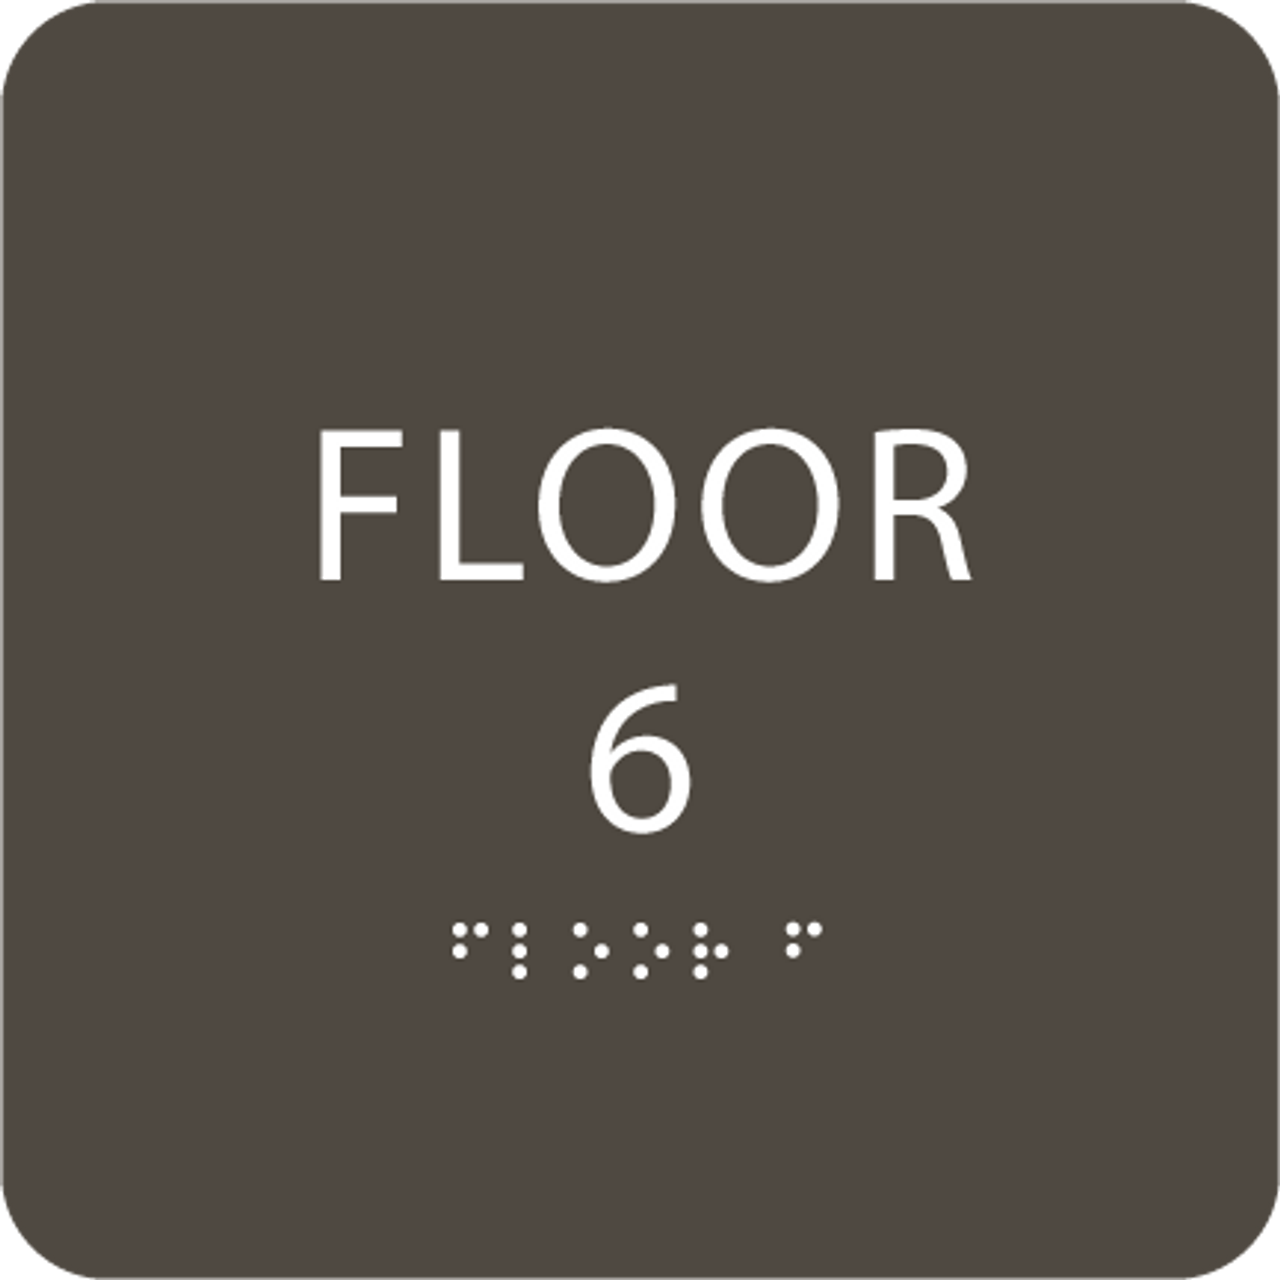 Olive Floor 6 Level Identification ADA Sign